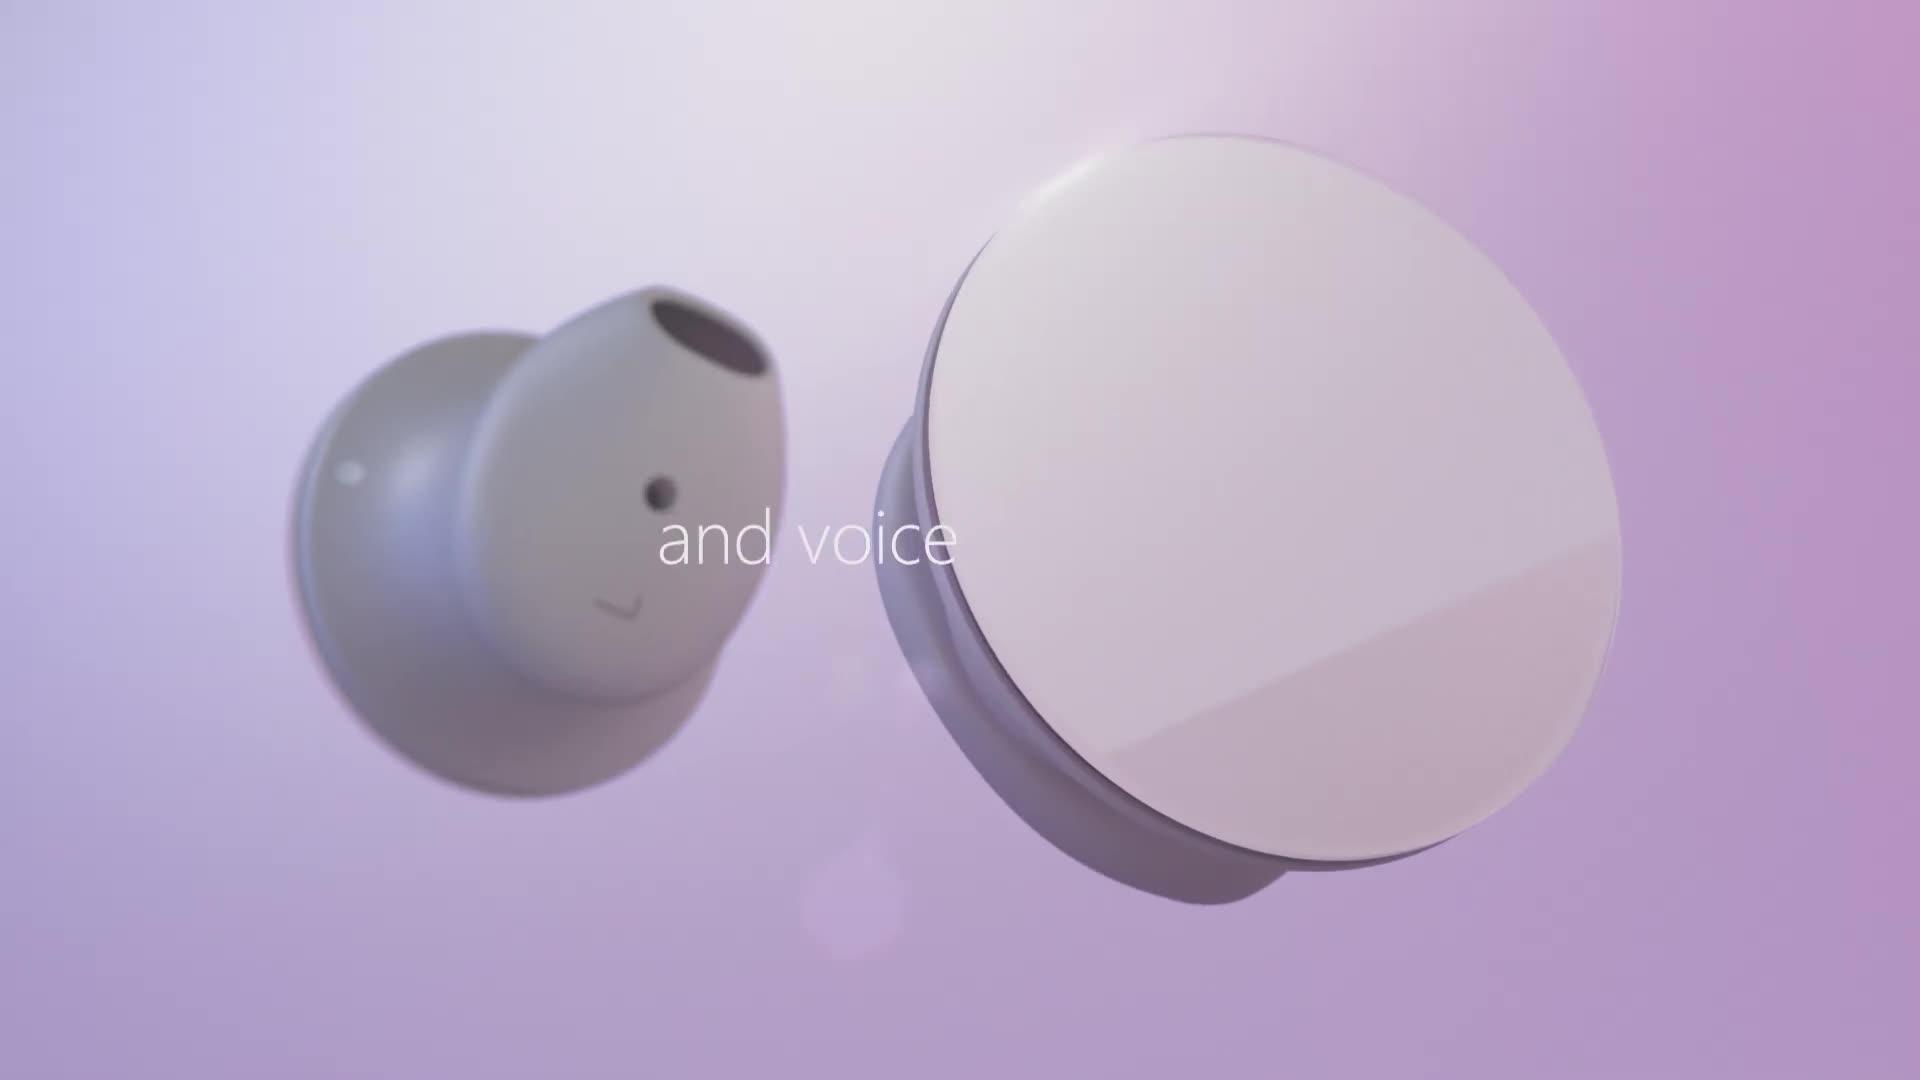 Microsoft, Surface, Microsoft Surface, Kopfhörer, Surface earBuds, Microsoft Surface Earbuds